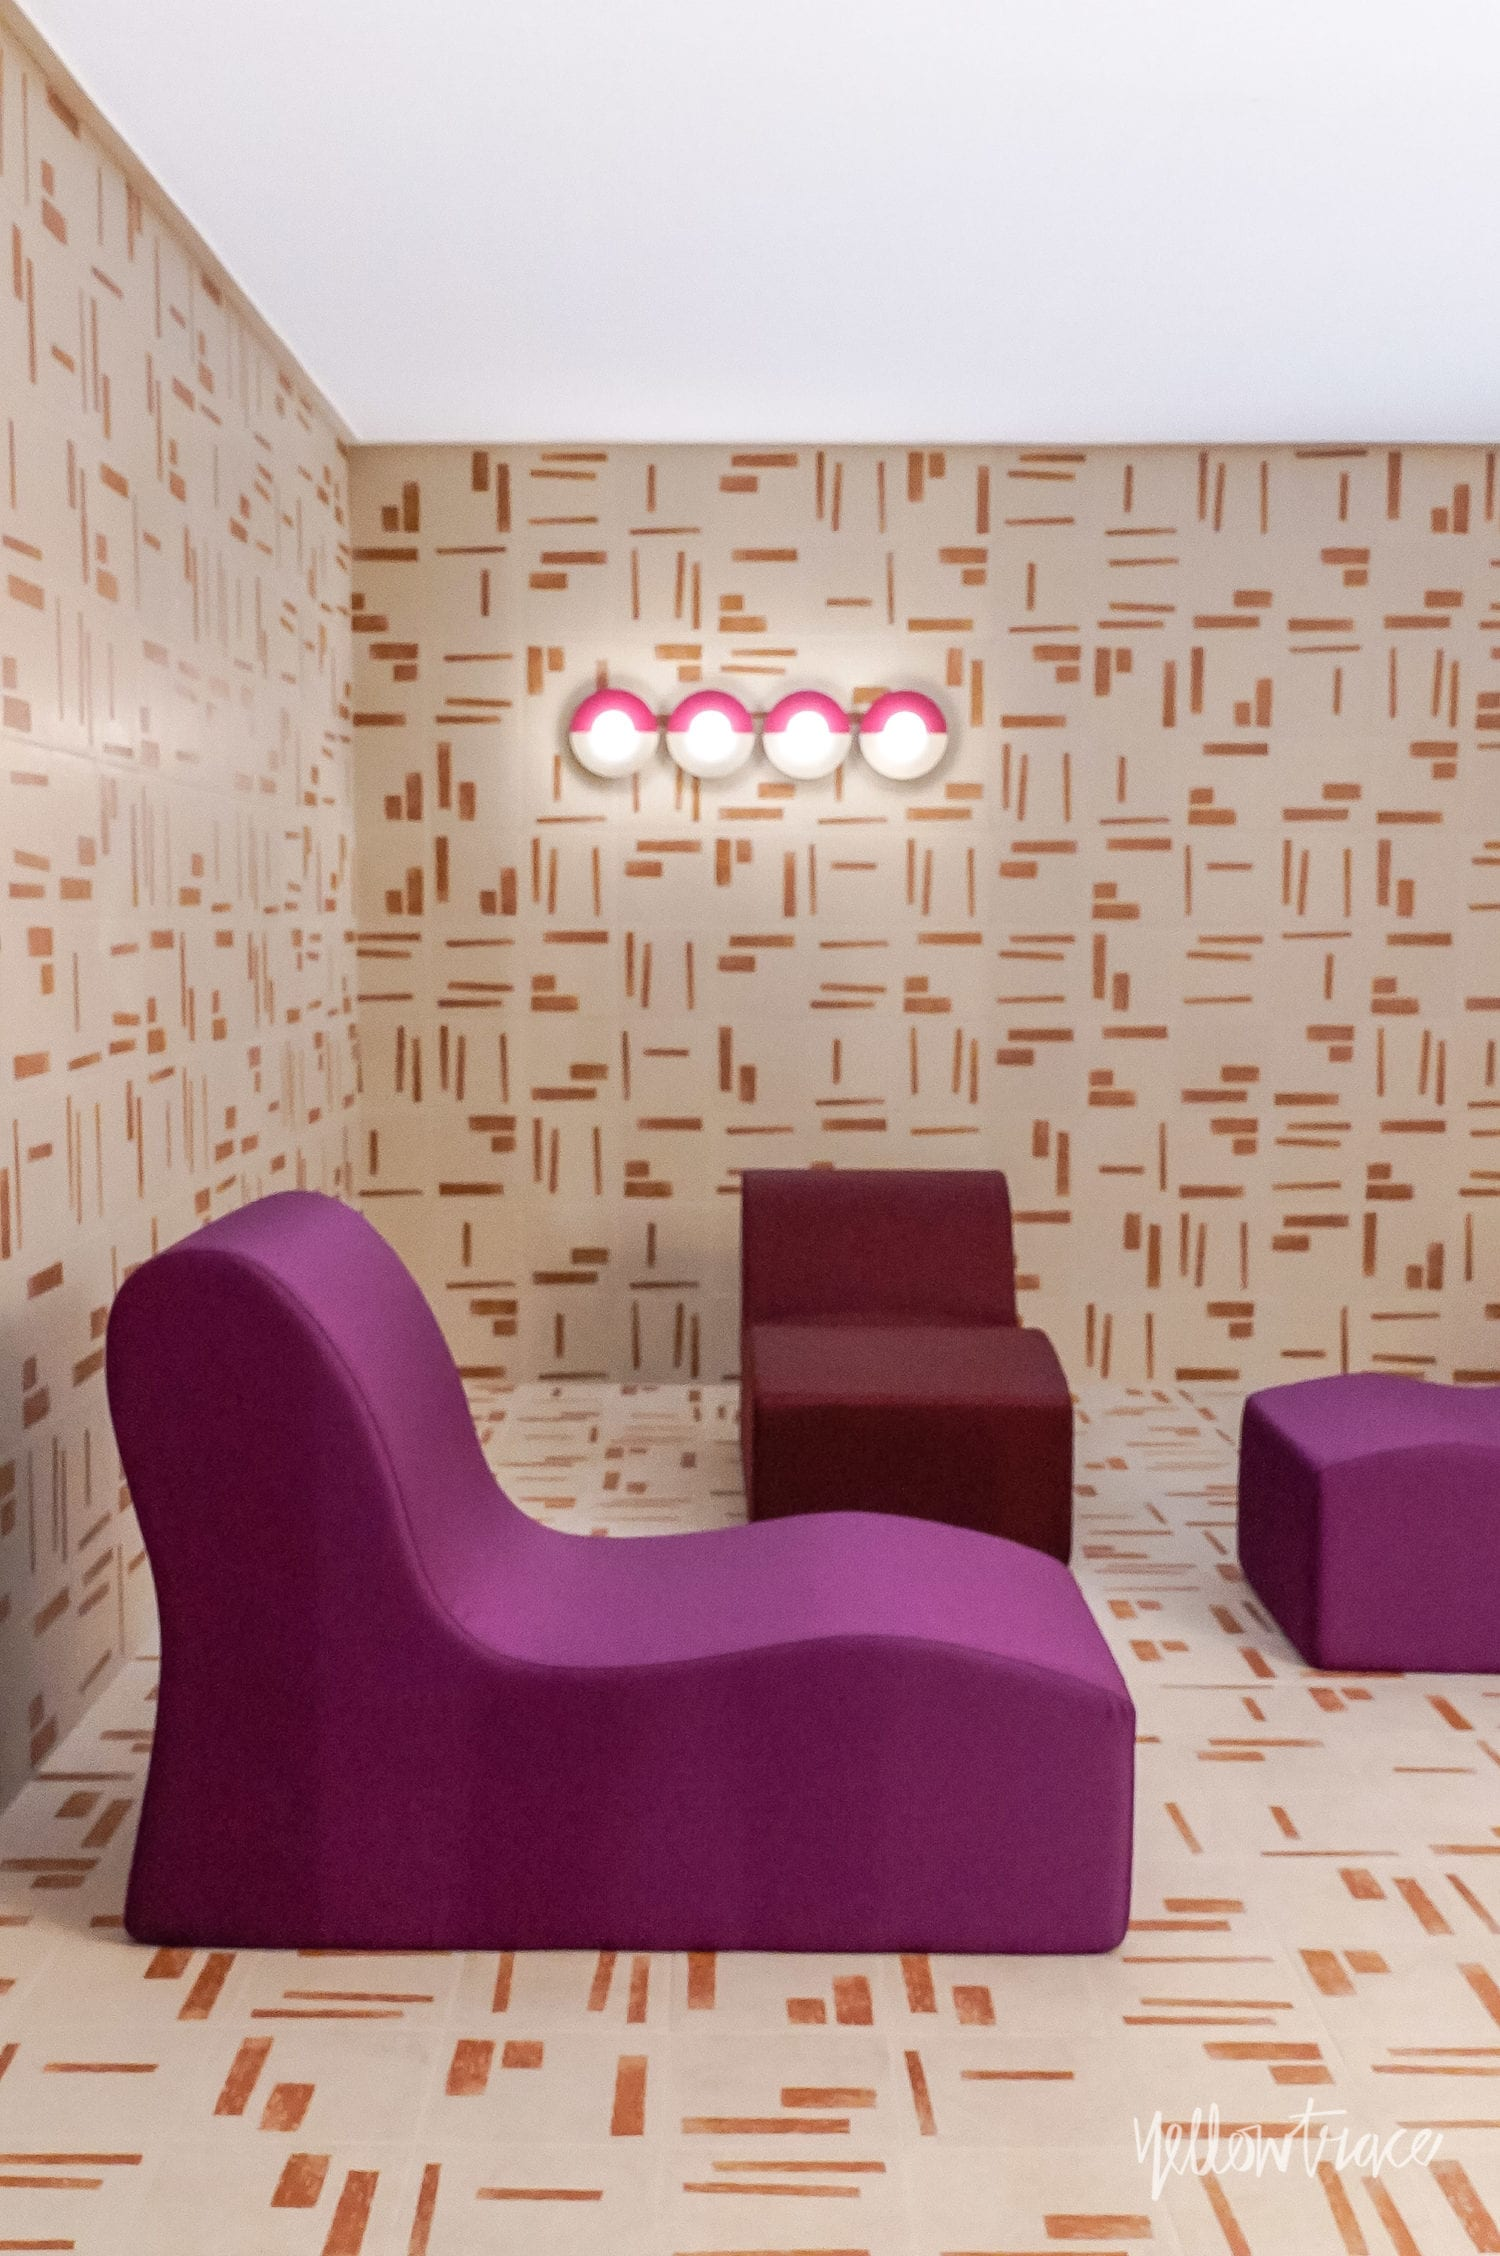 Les Arcanistes Studiopepe At Milan Design Week 2019 Photo Nick Hughes Yellowtrace 25